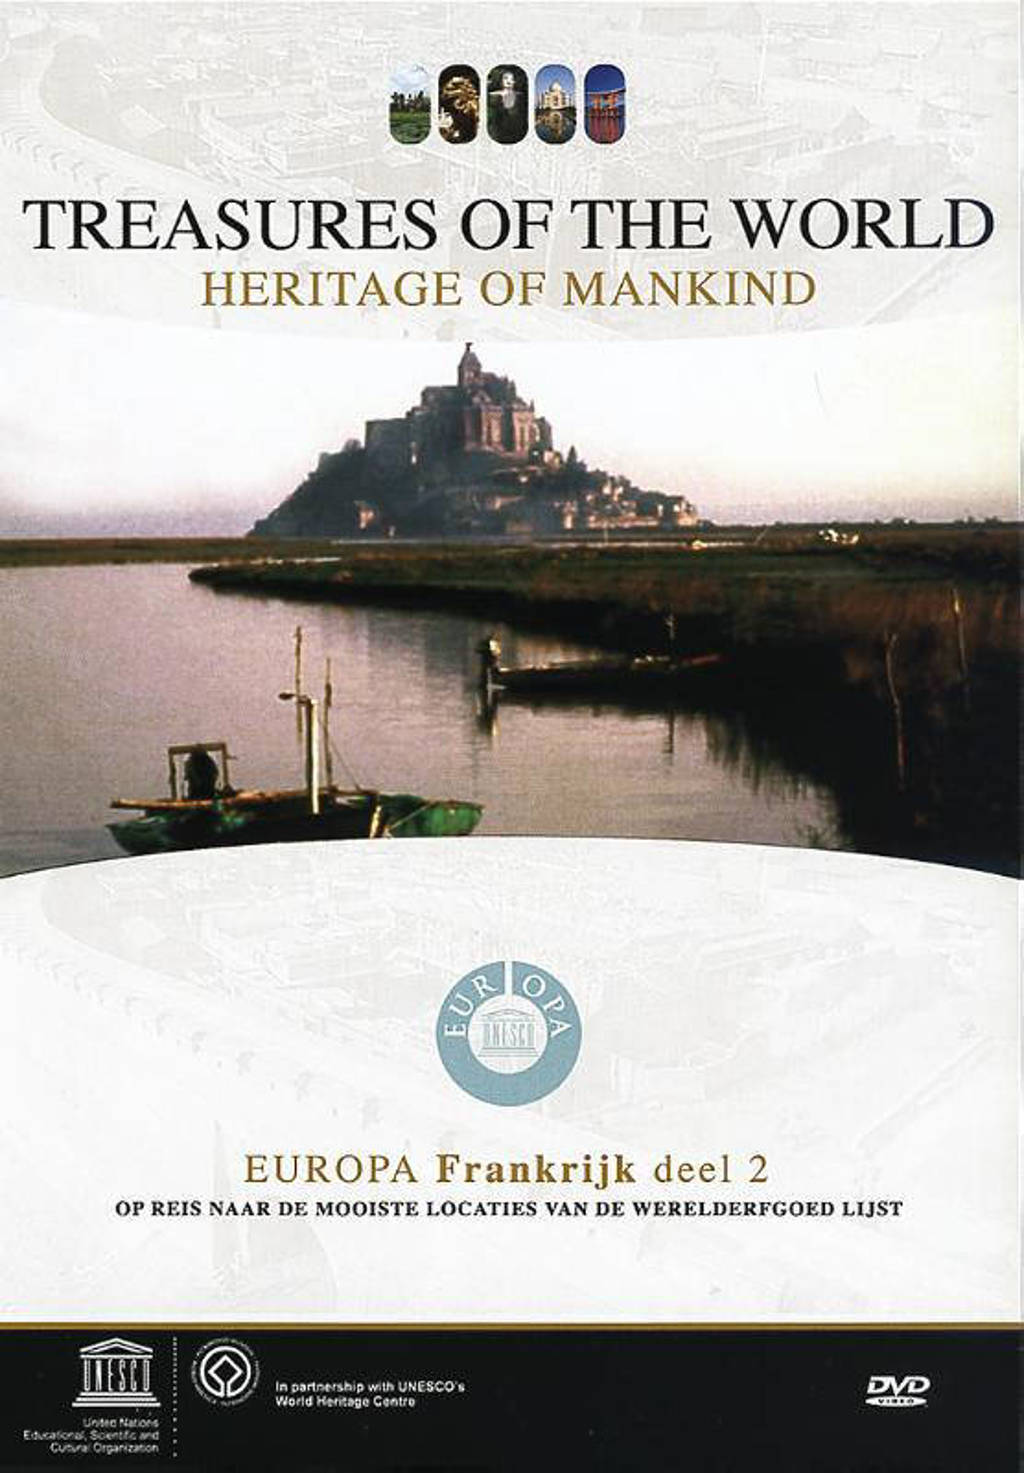 Treasures of the world-frankrijk 2 (DVD)